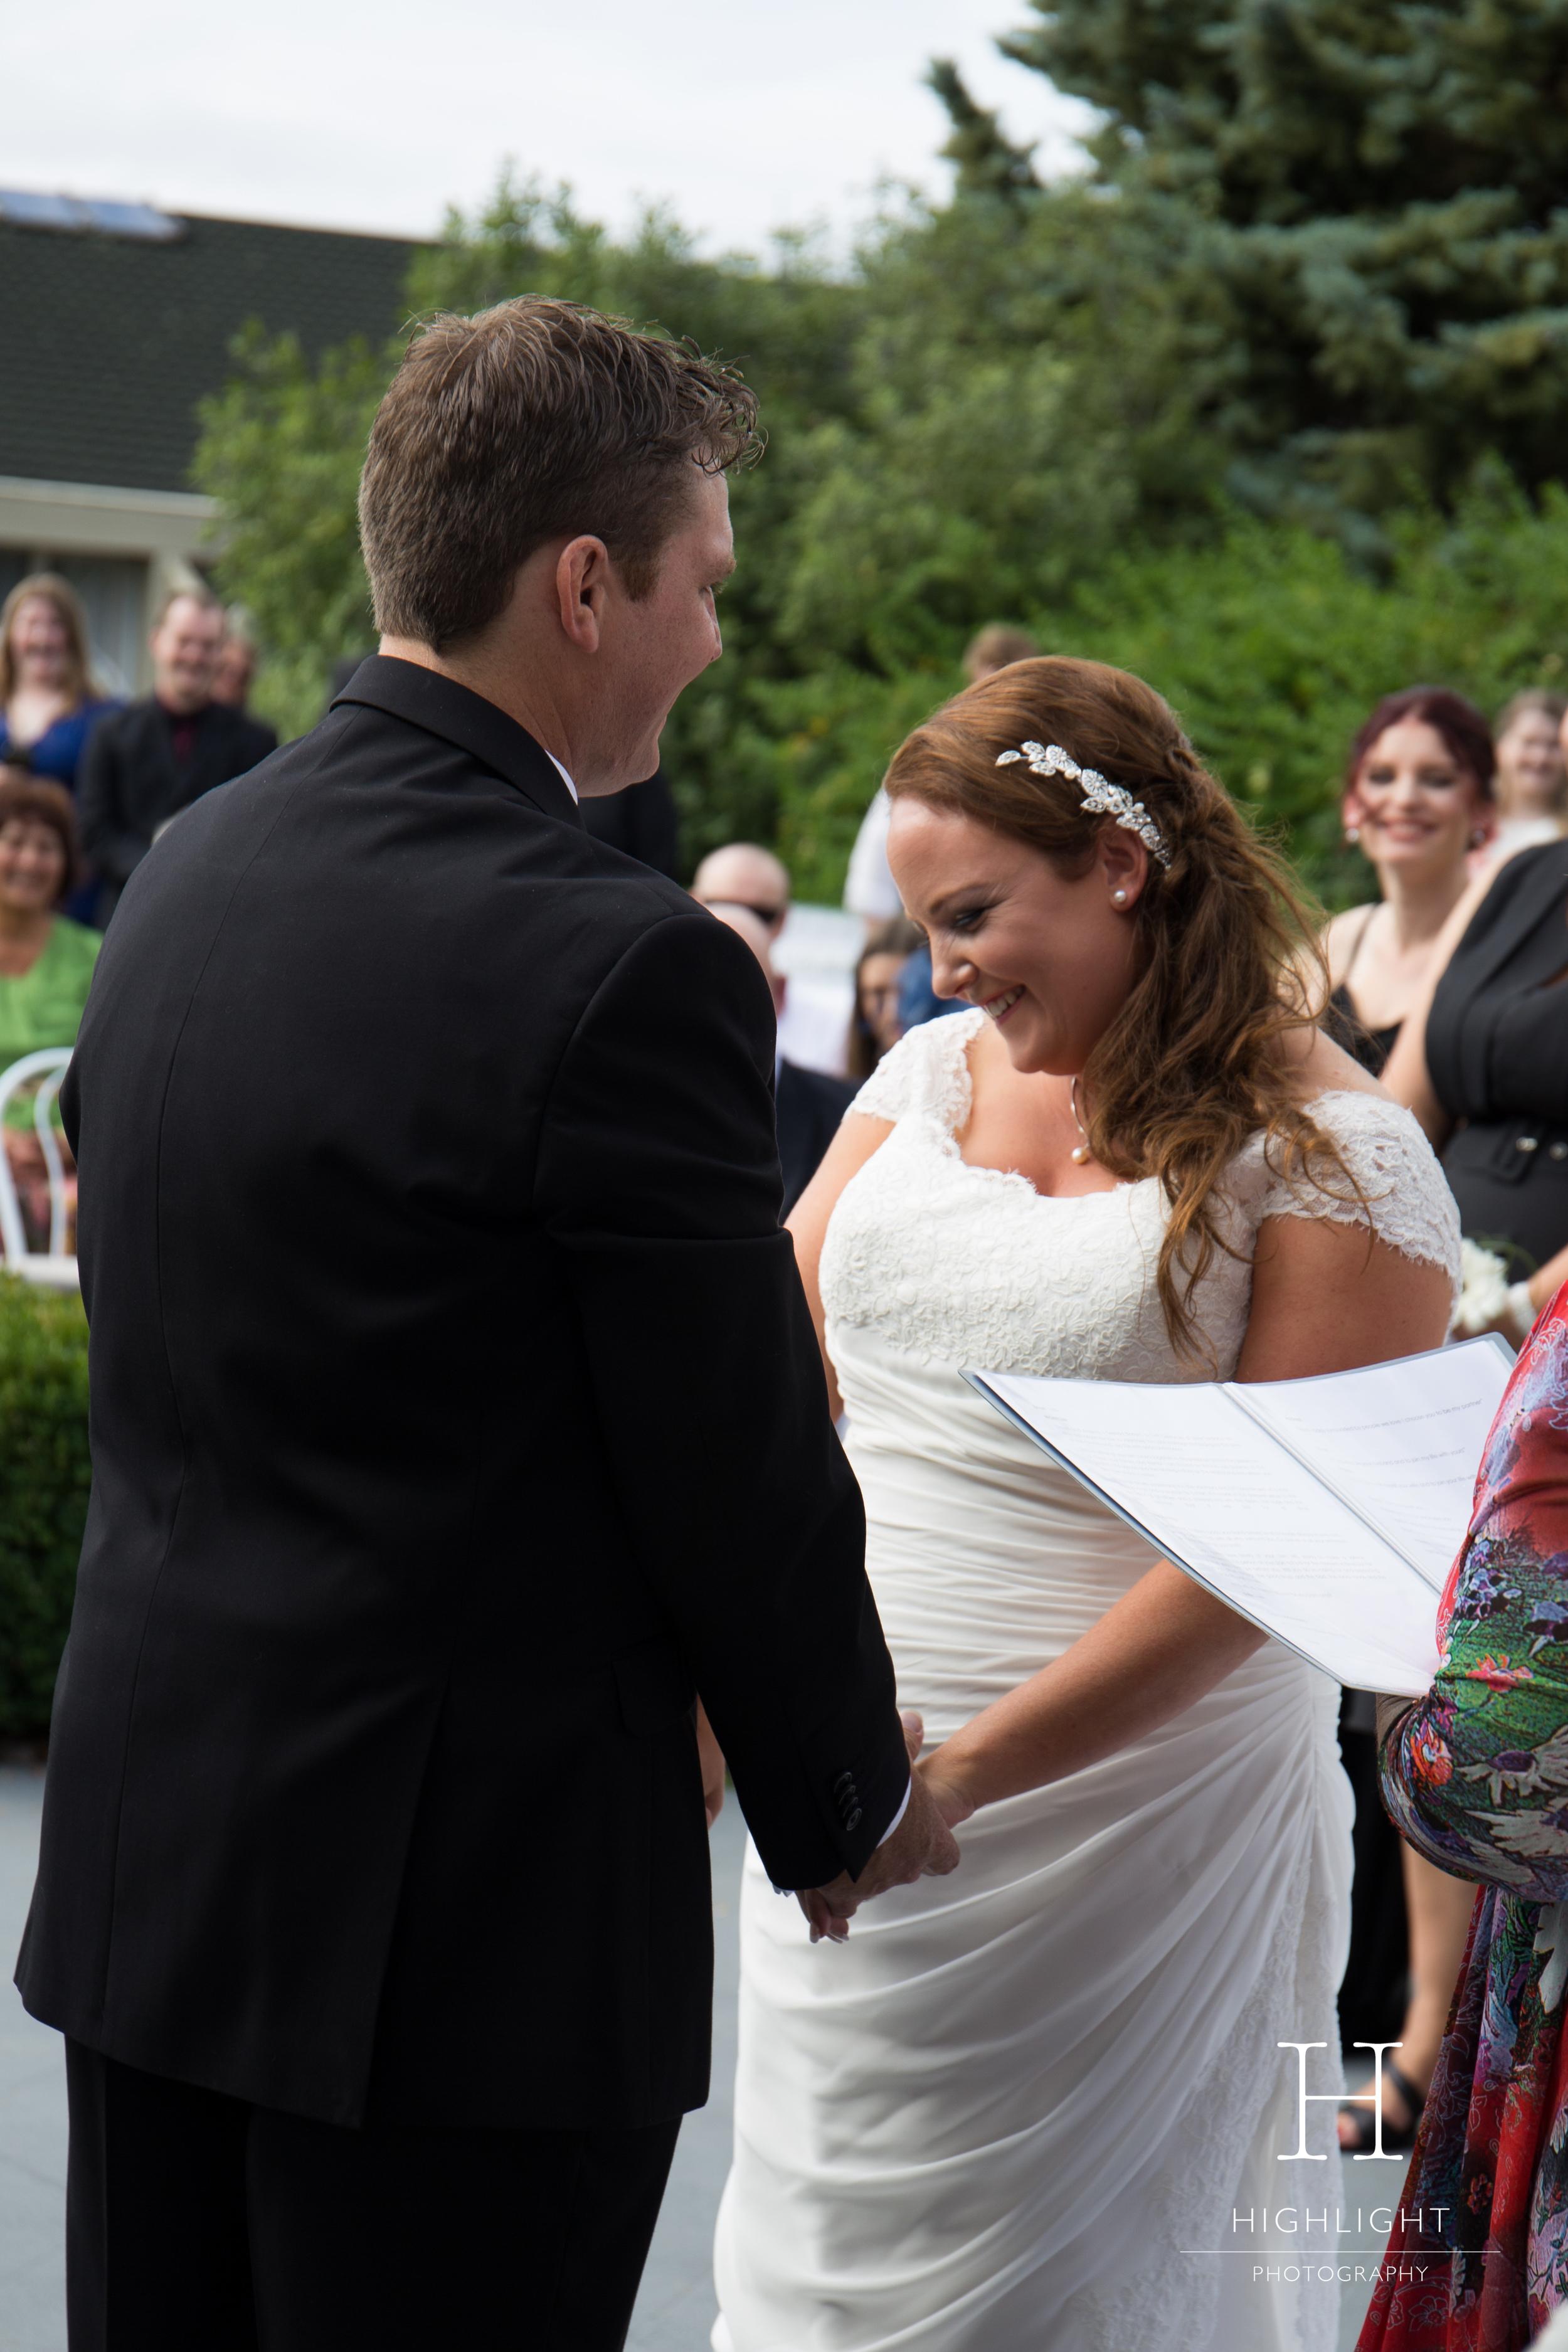 highlight_photography_wedding_new_zealand_ceremony.jpg